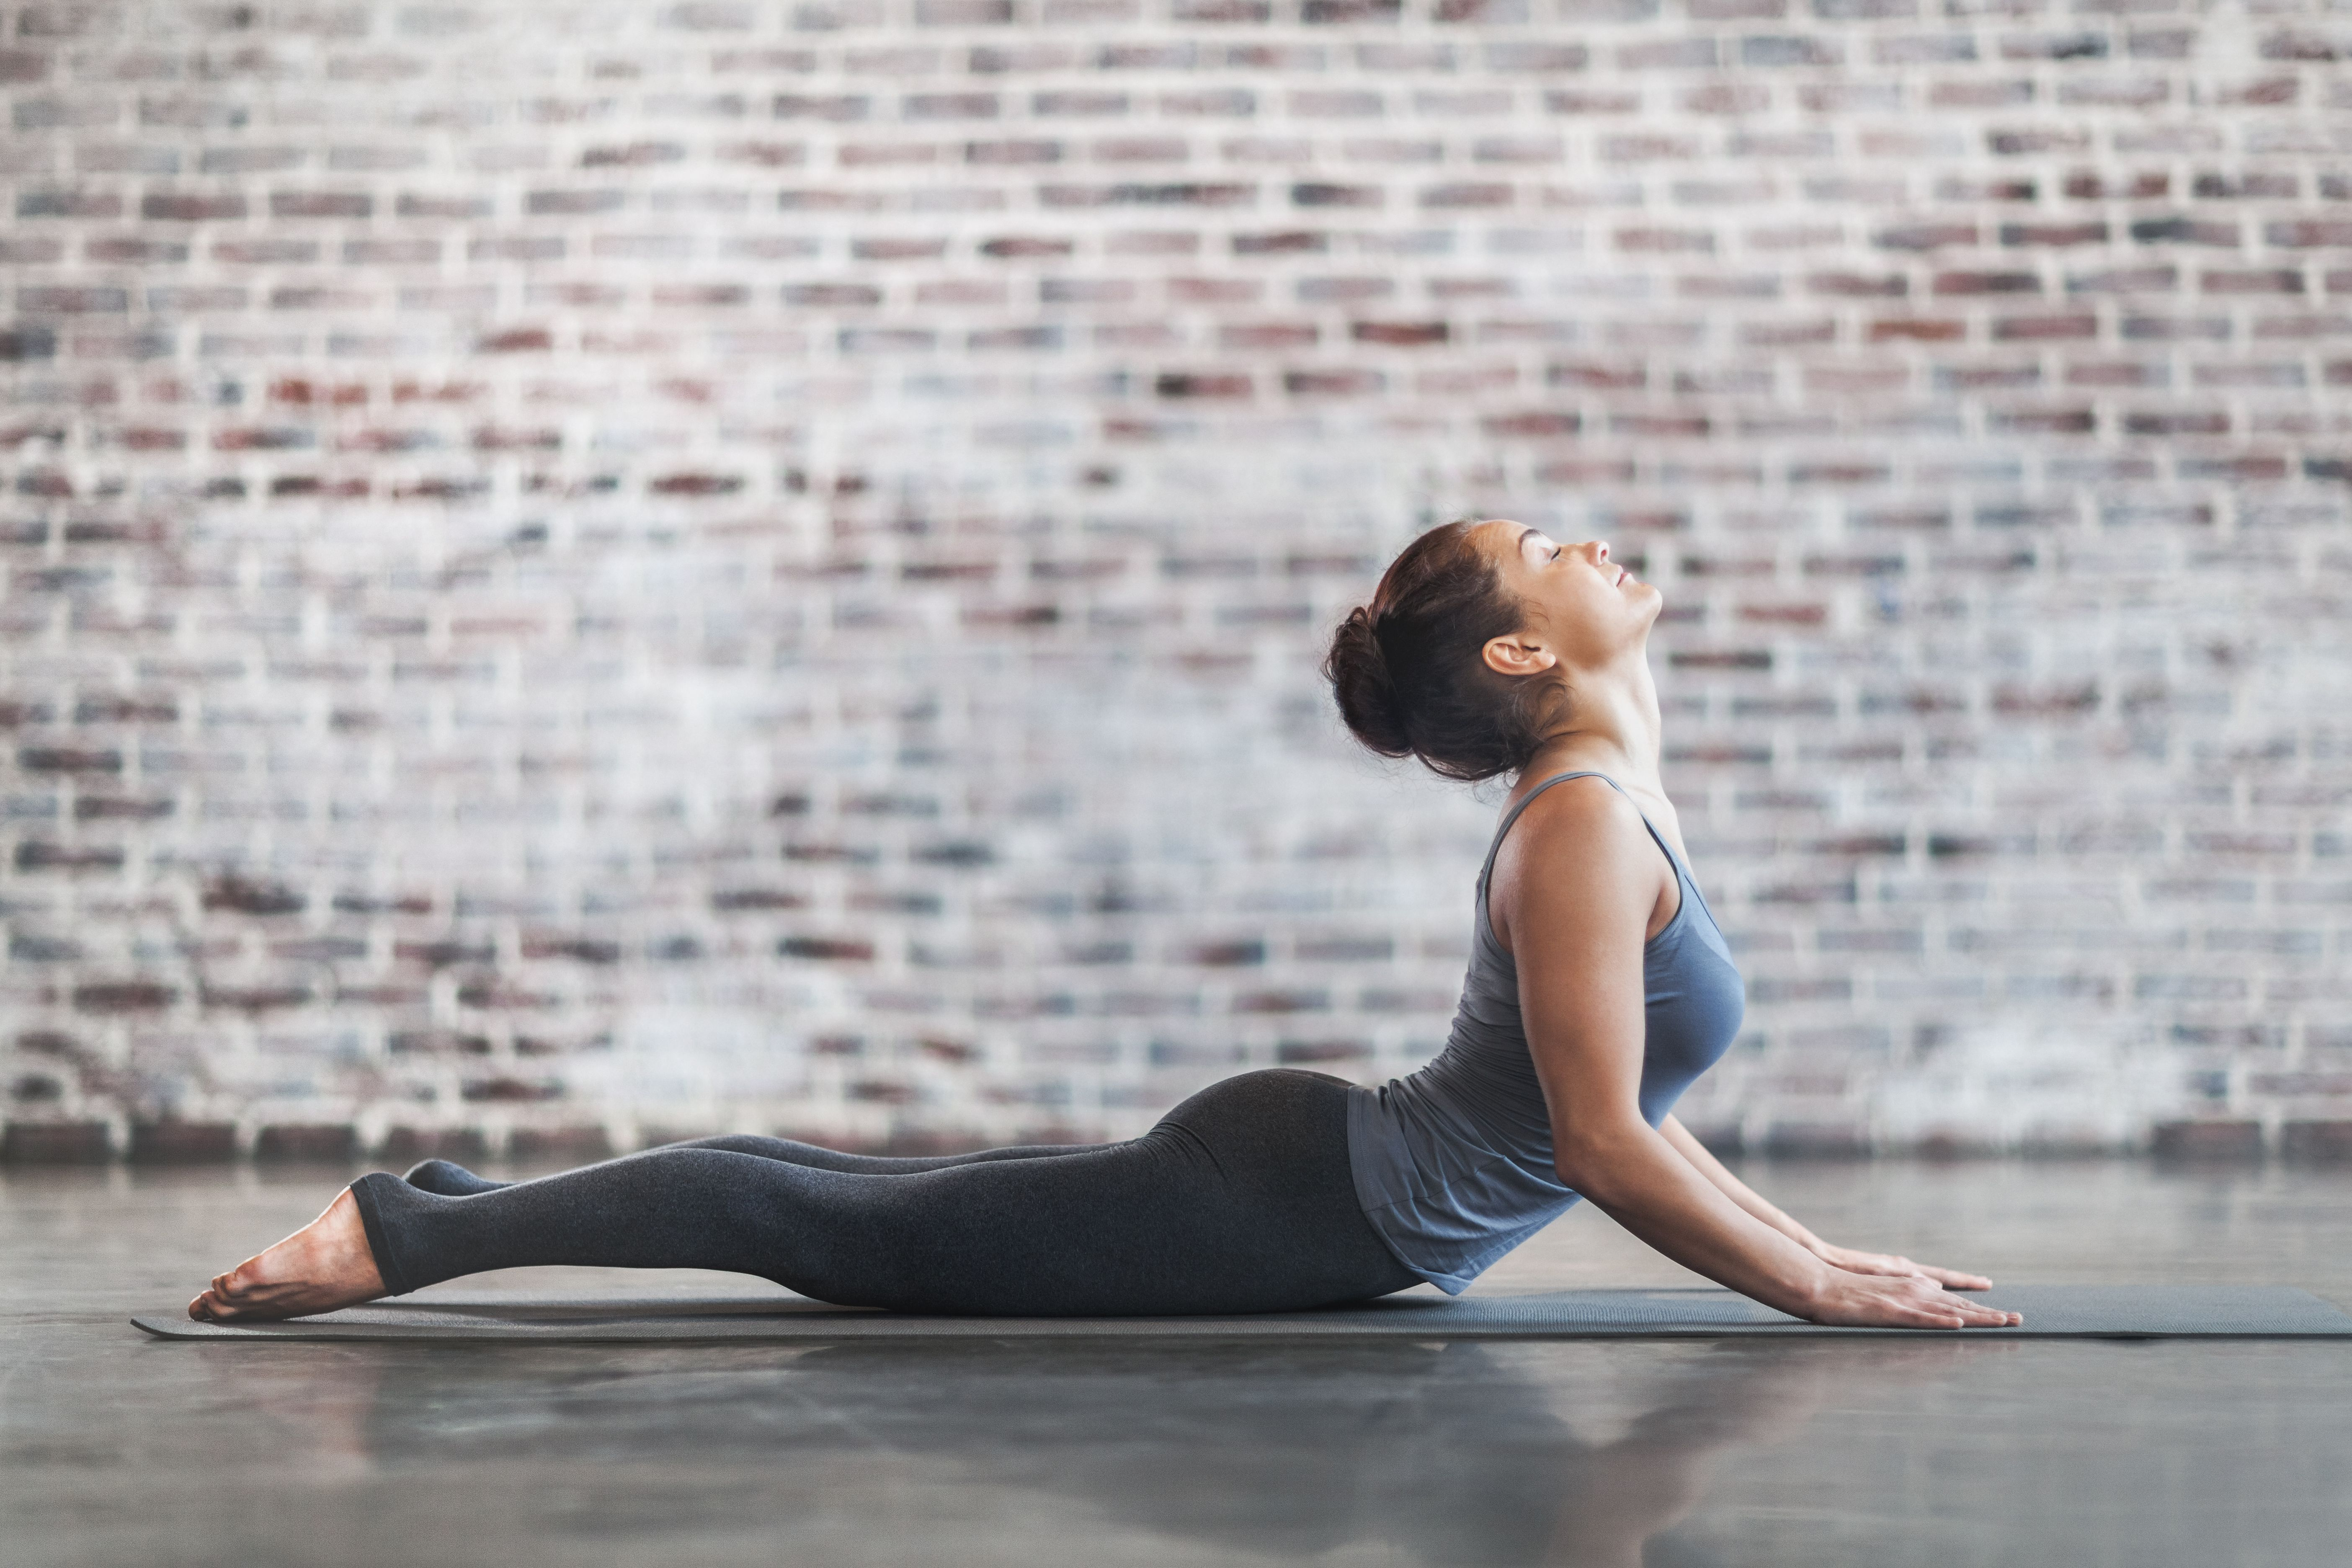 SGA y Streching Miofascial Postural: Servicios de Pilates By Mauge